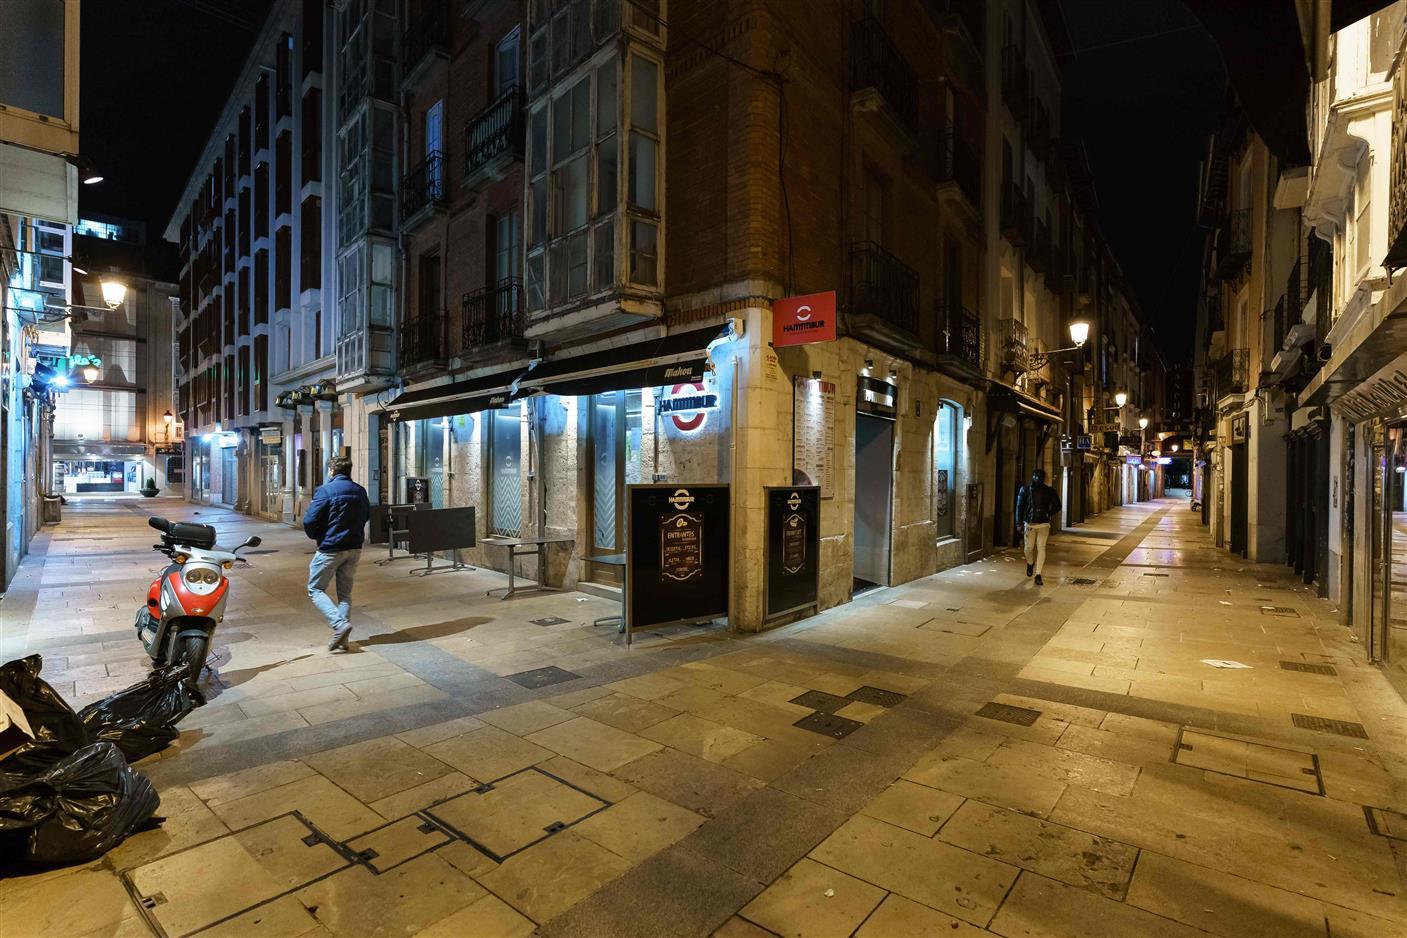 Covid19: National Emergency In Spain